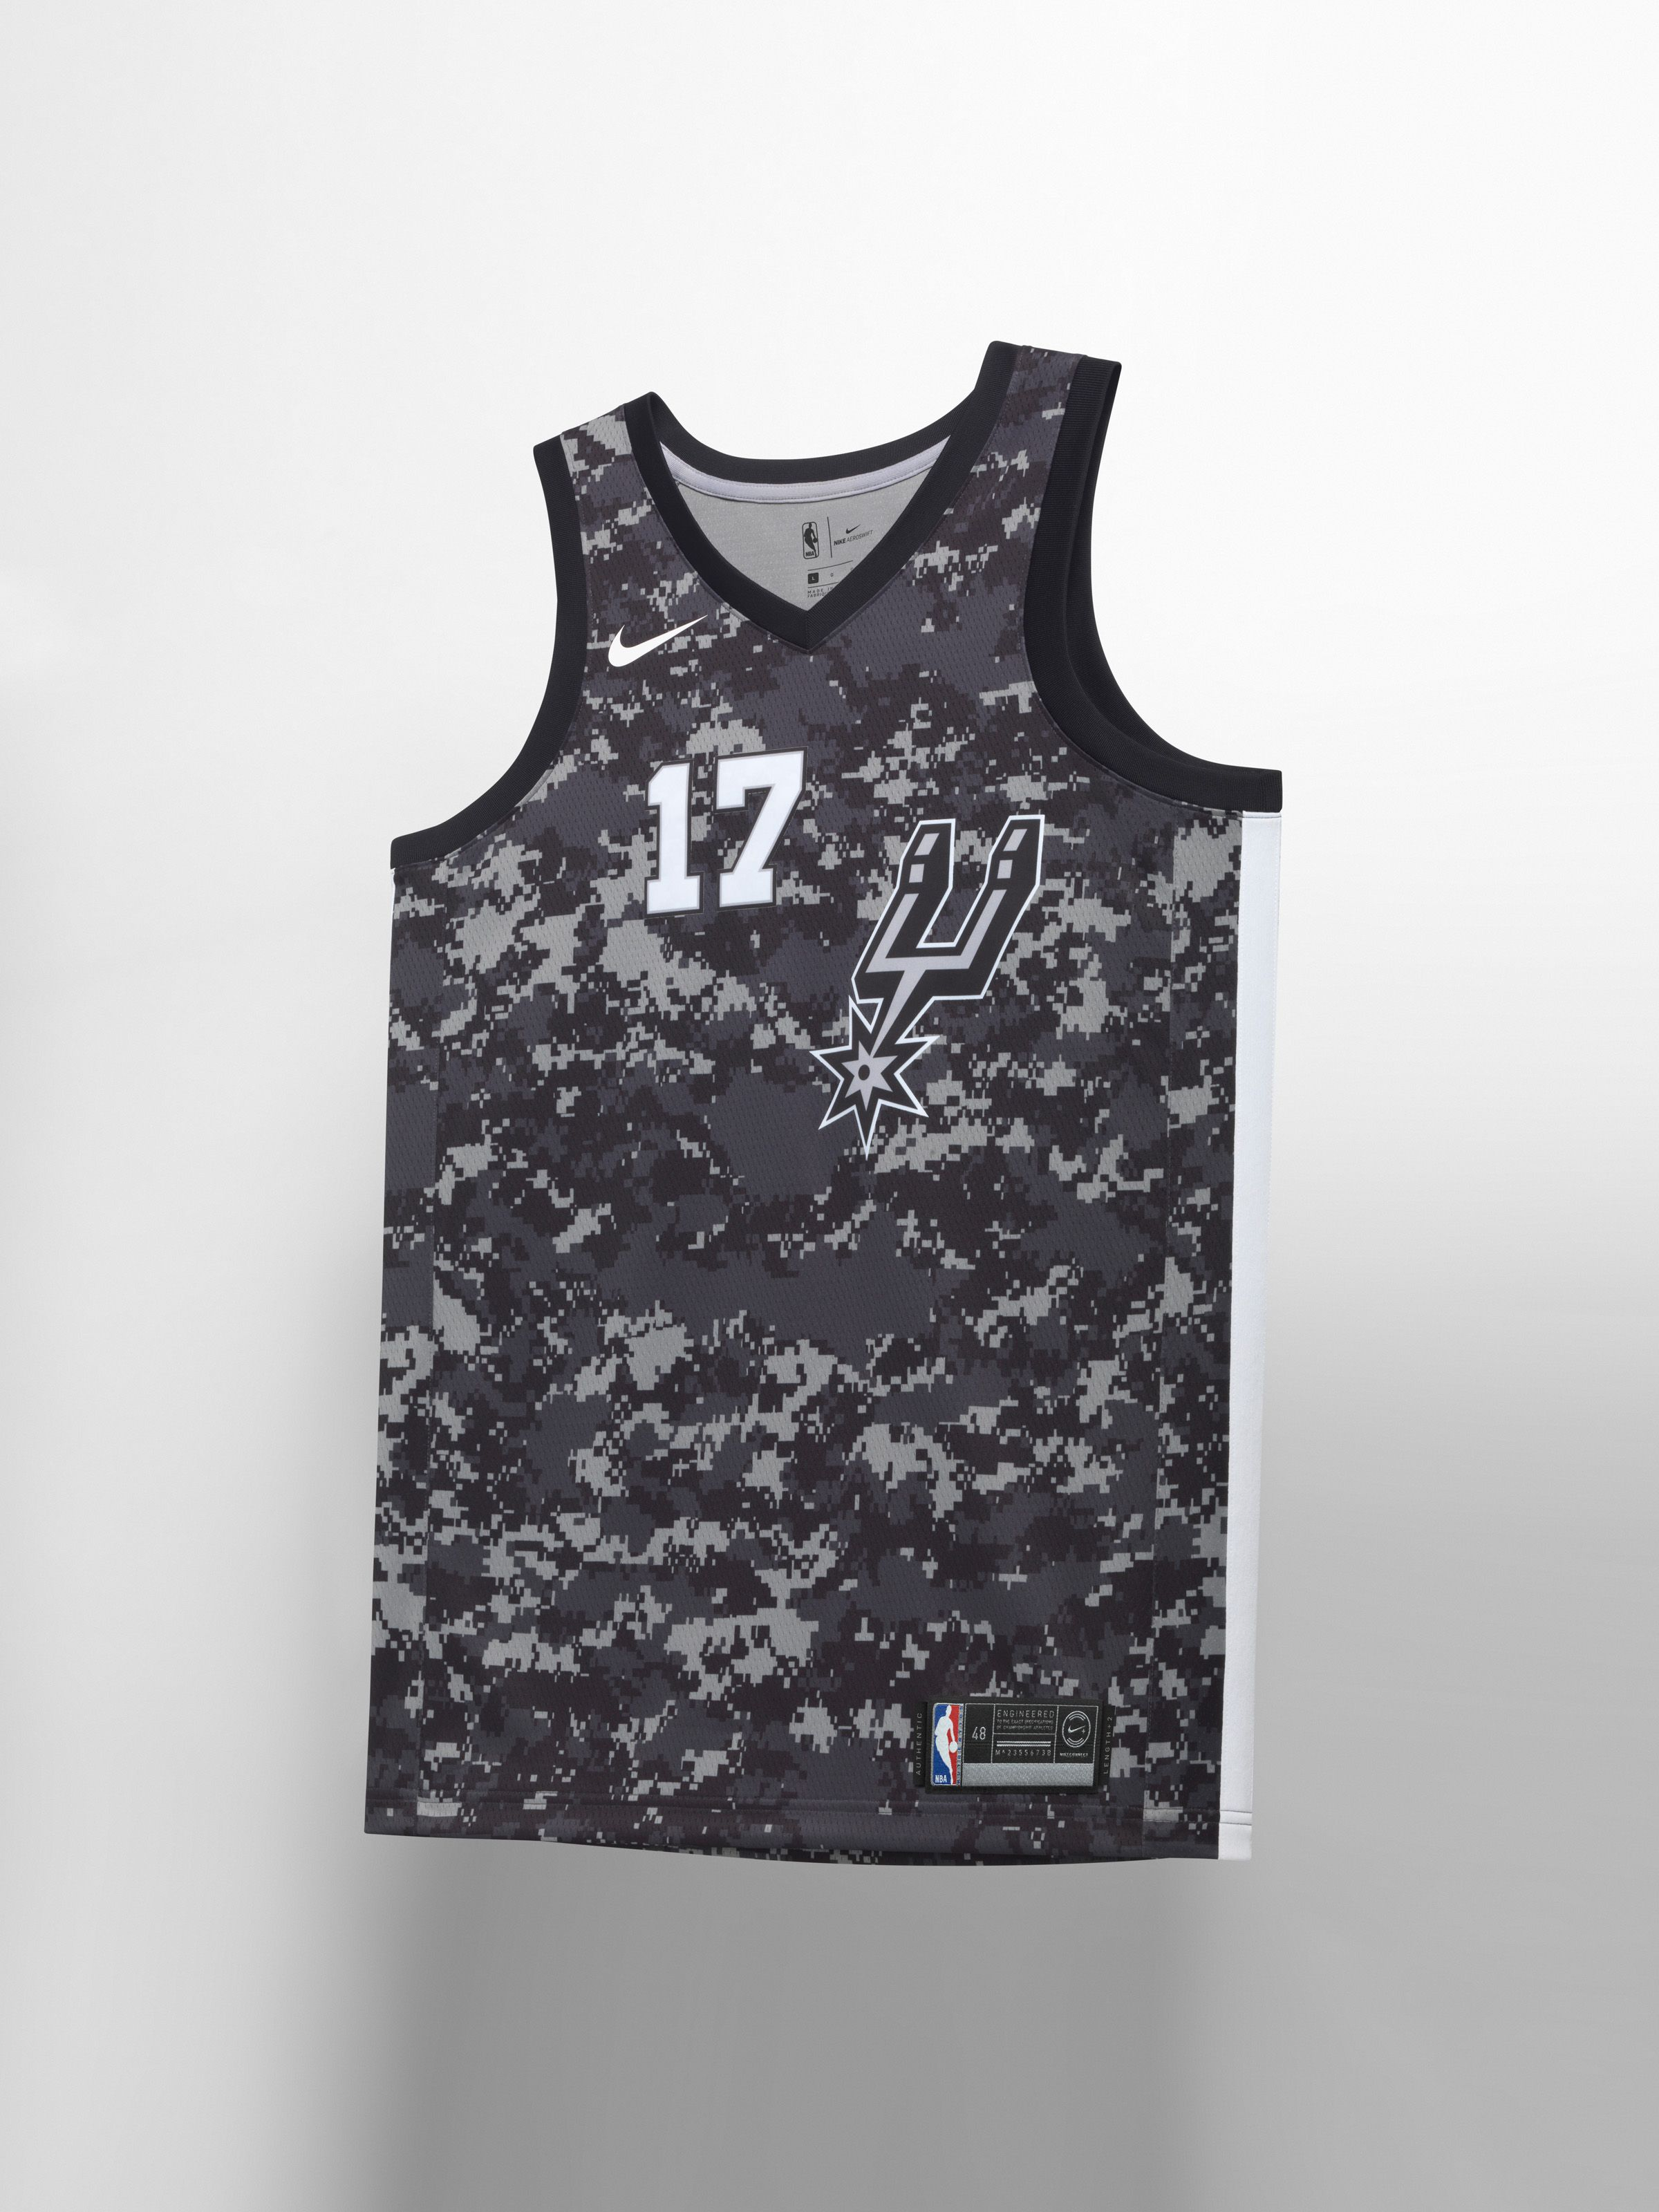 62dd047d0 San Antonio Spurs